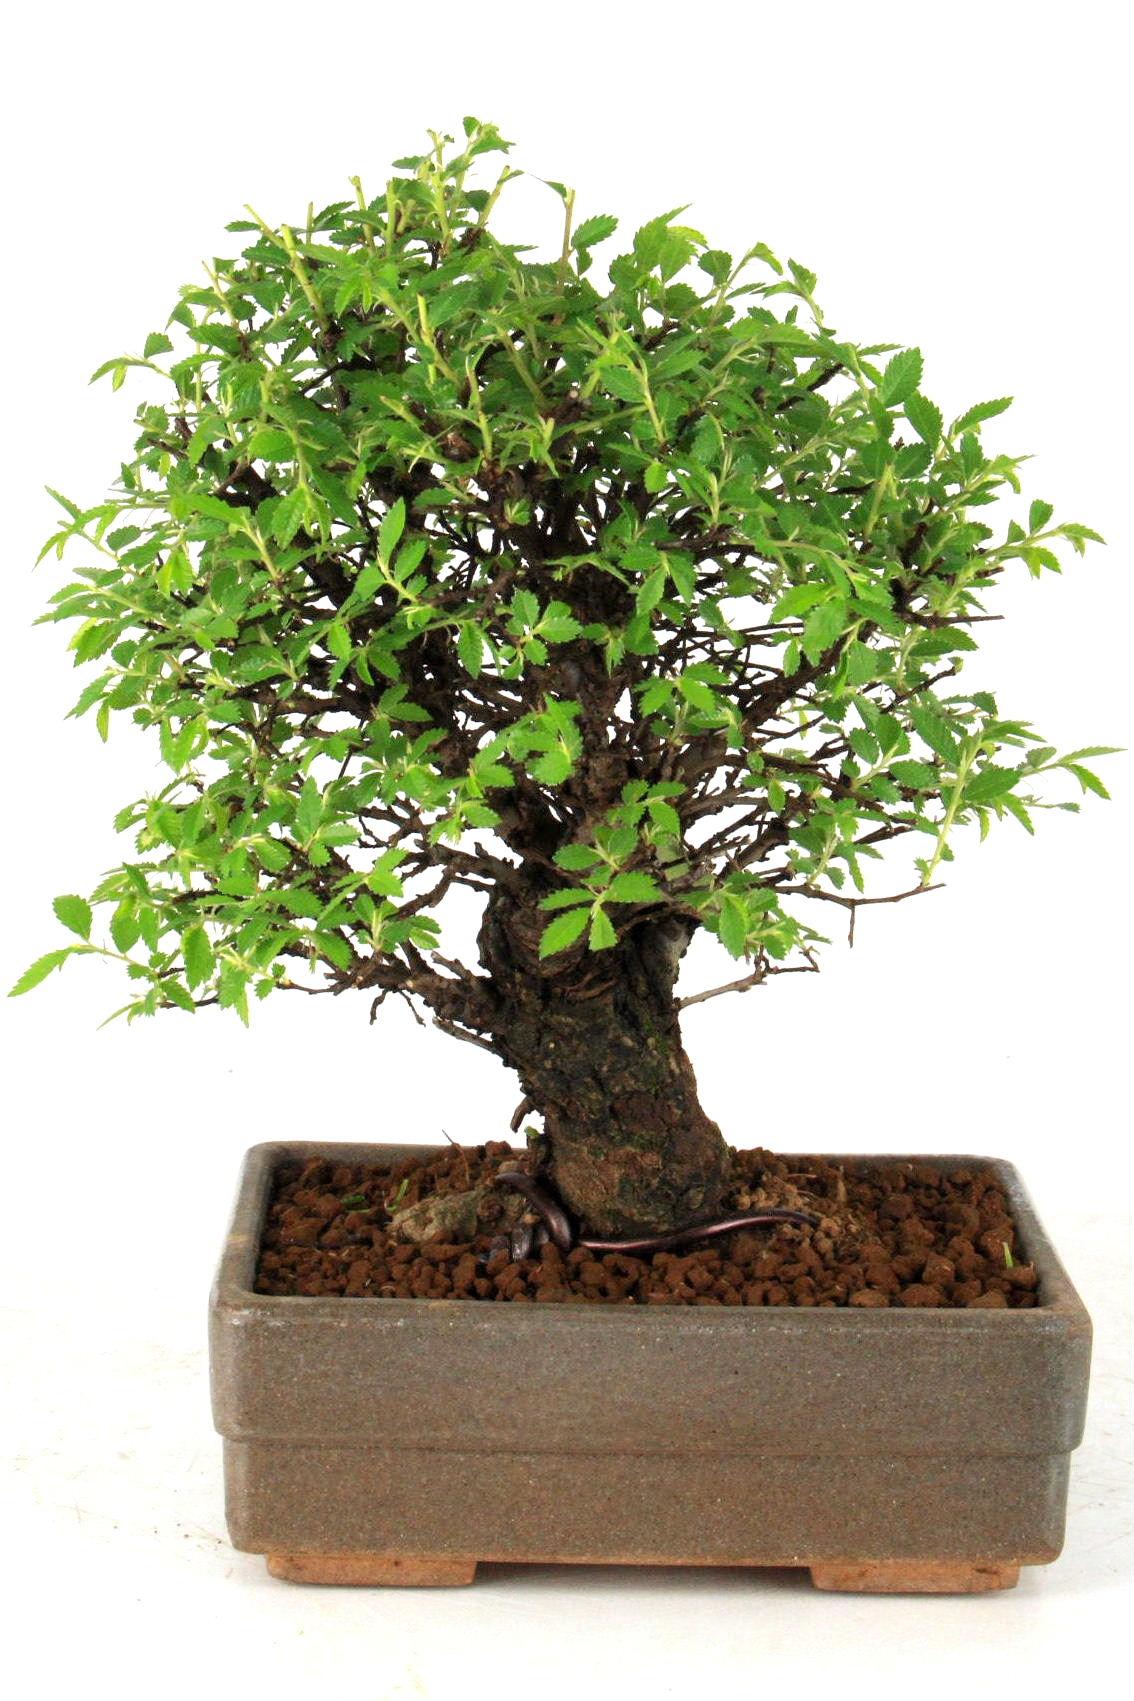 Japanische ulme bonsai 27 cm 1628 bei oyaki bonsai kaufen for Bonsai versand